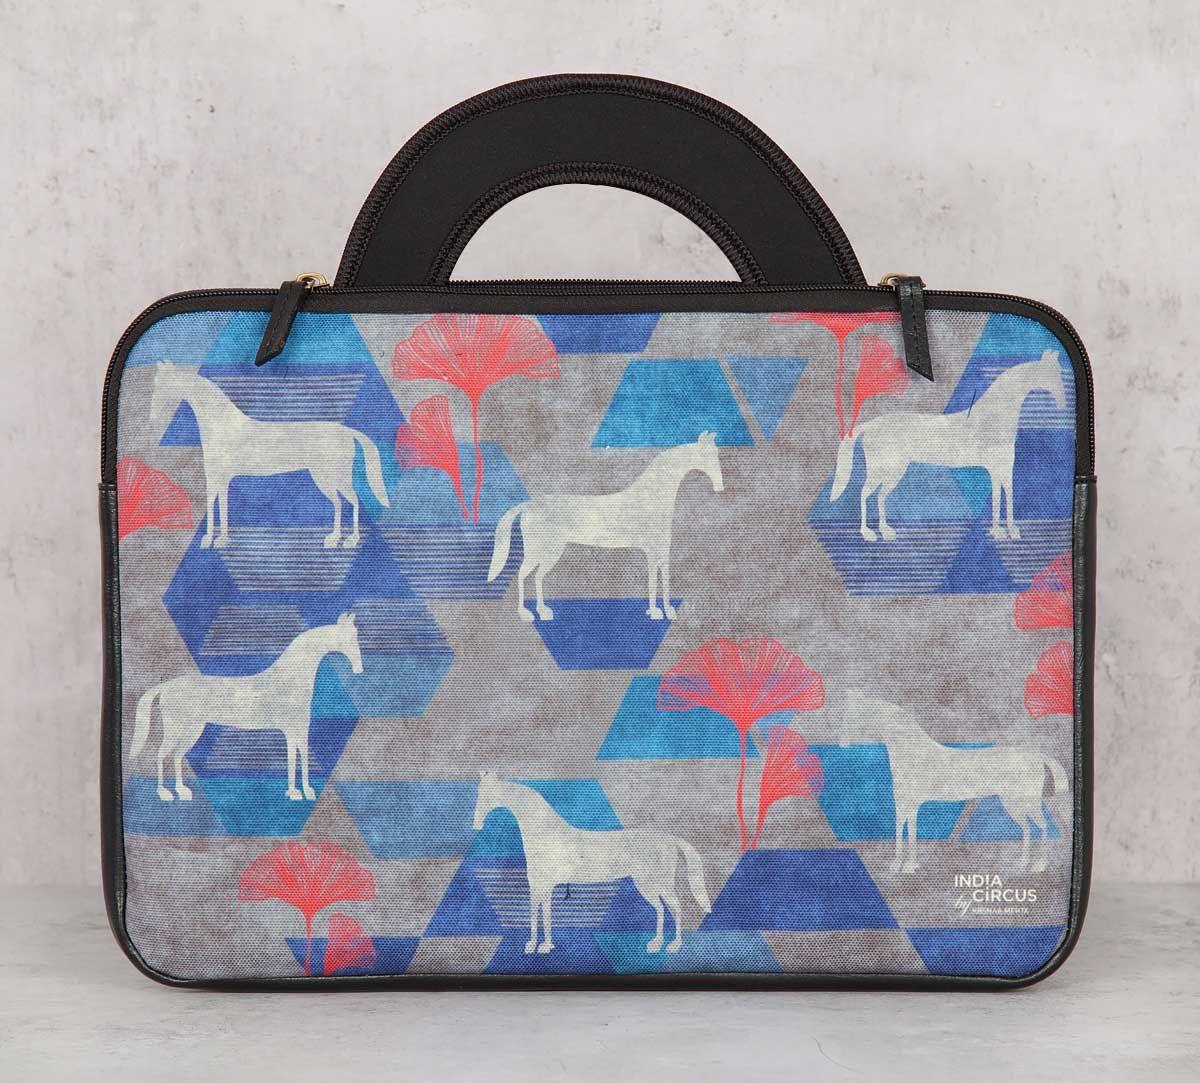 India Circus Grey Gallant Gypsy 13-inch Laptop Bag